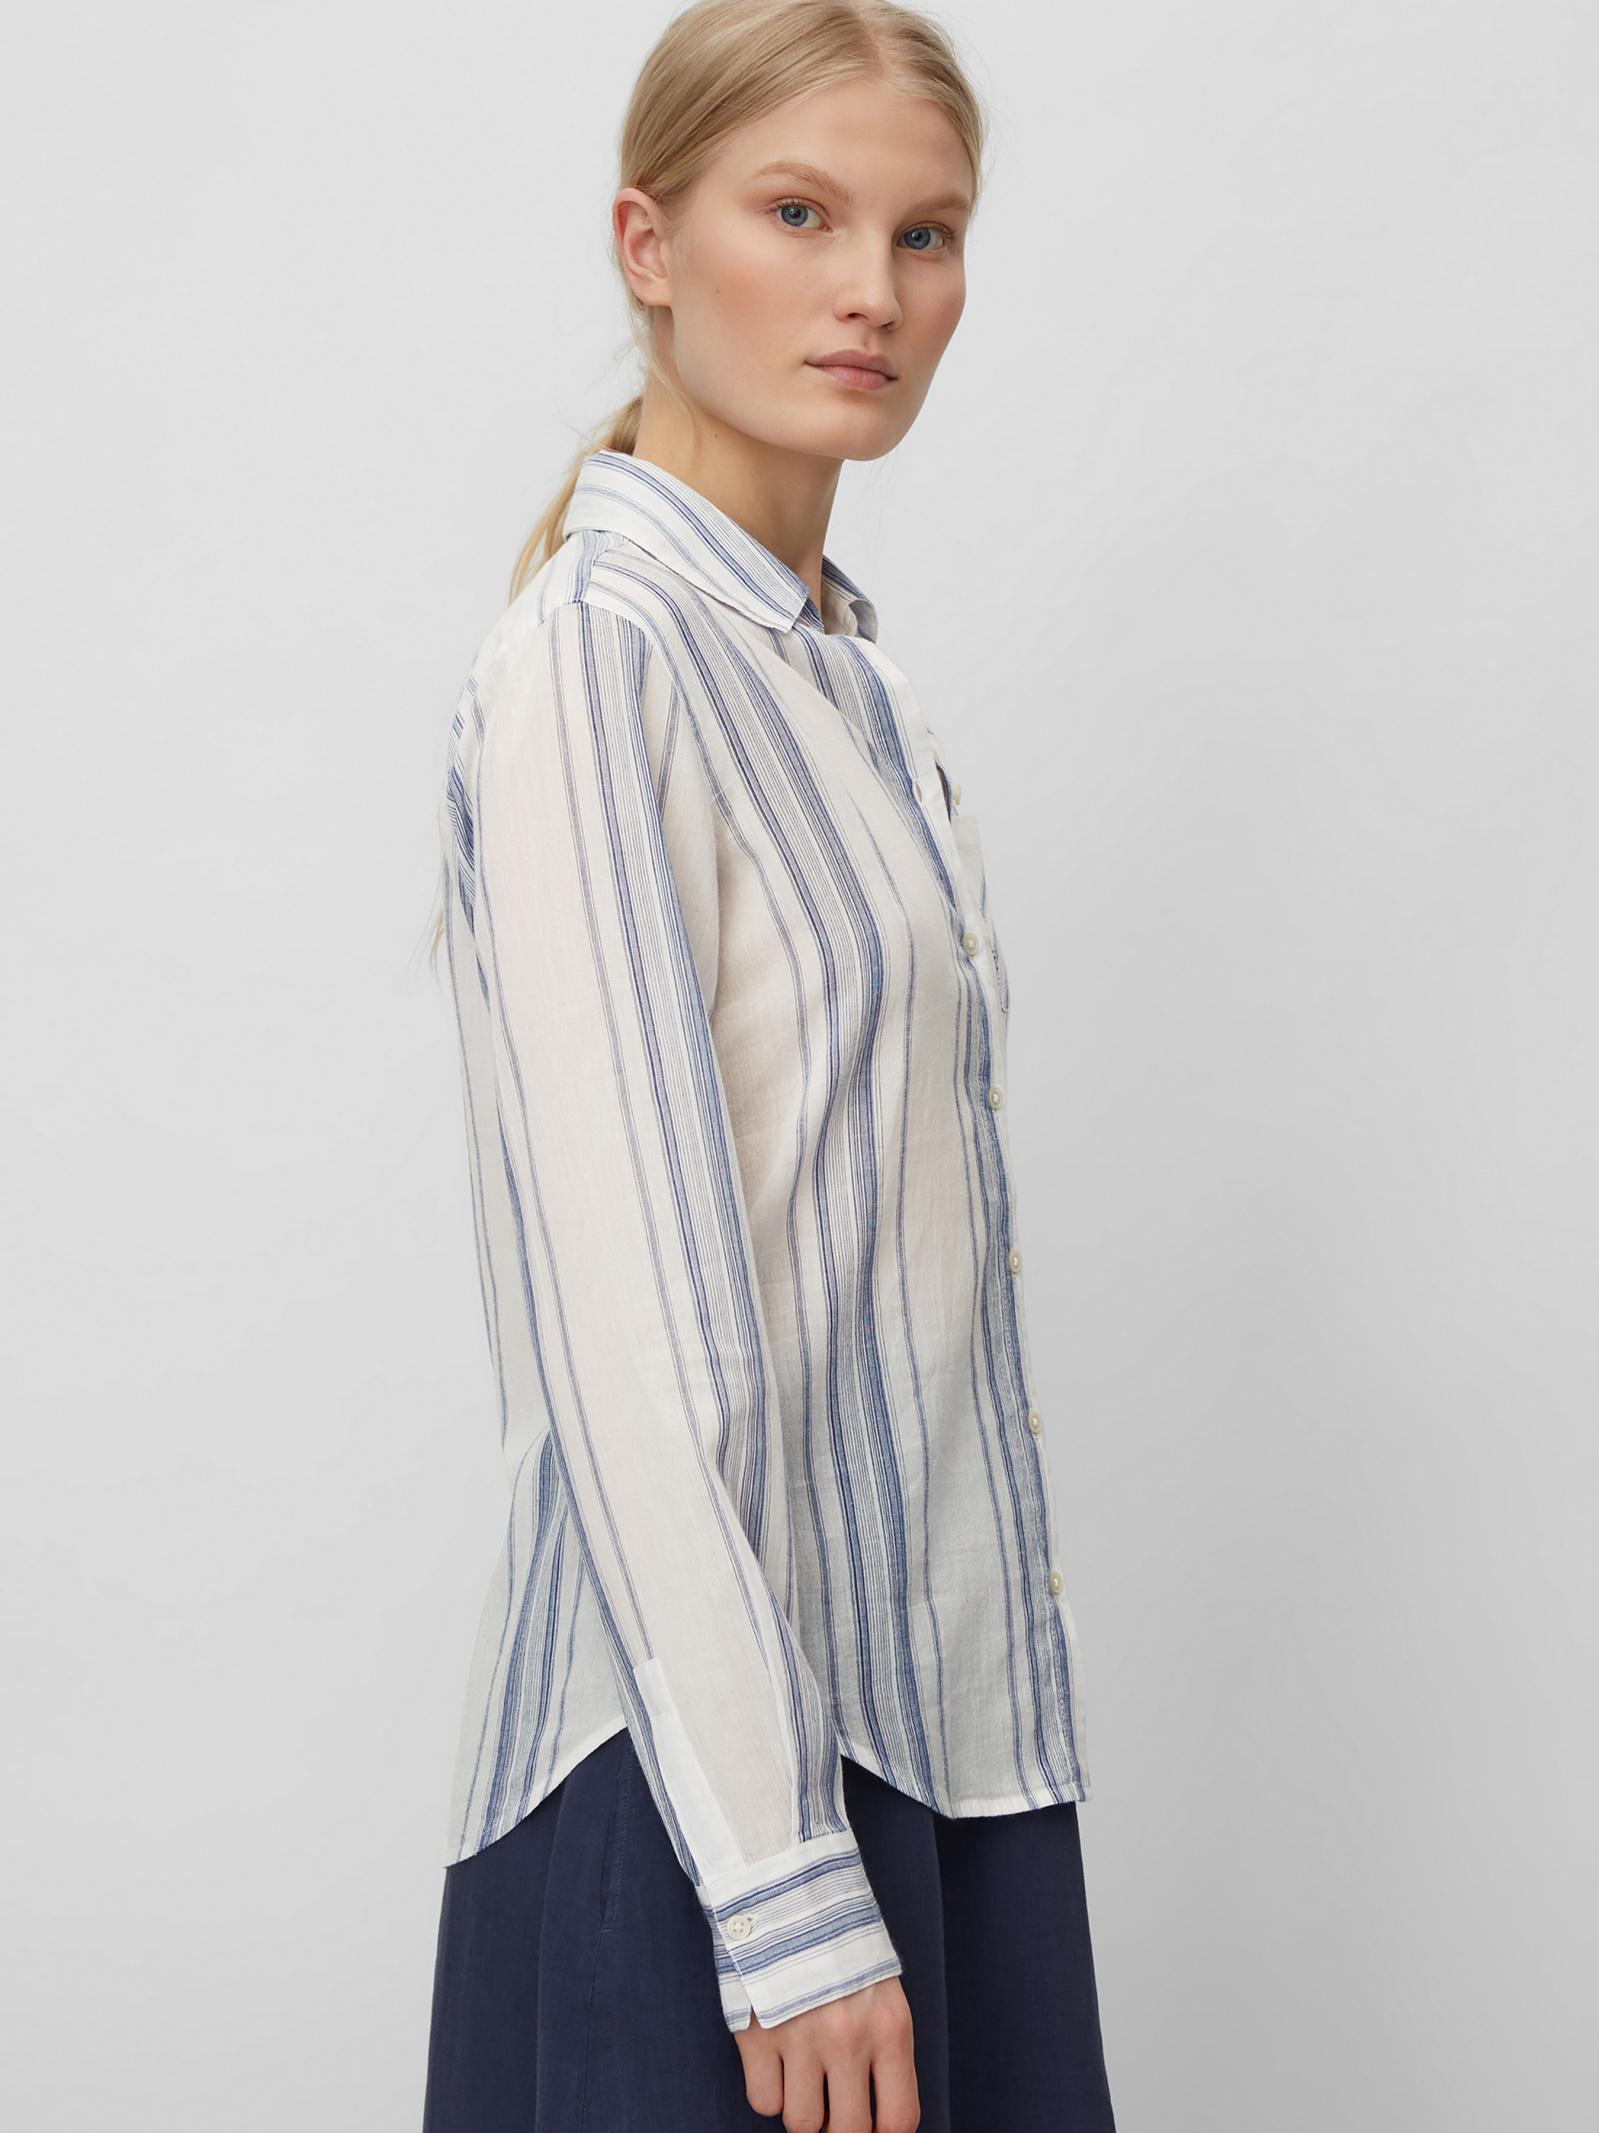 Marc O'Polo Блуза жіночі модель 004135342525-G69 , 2017